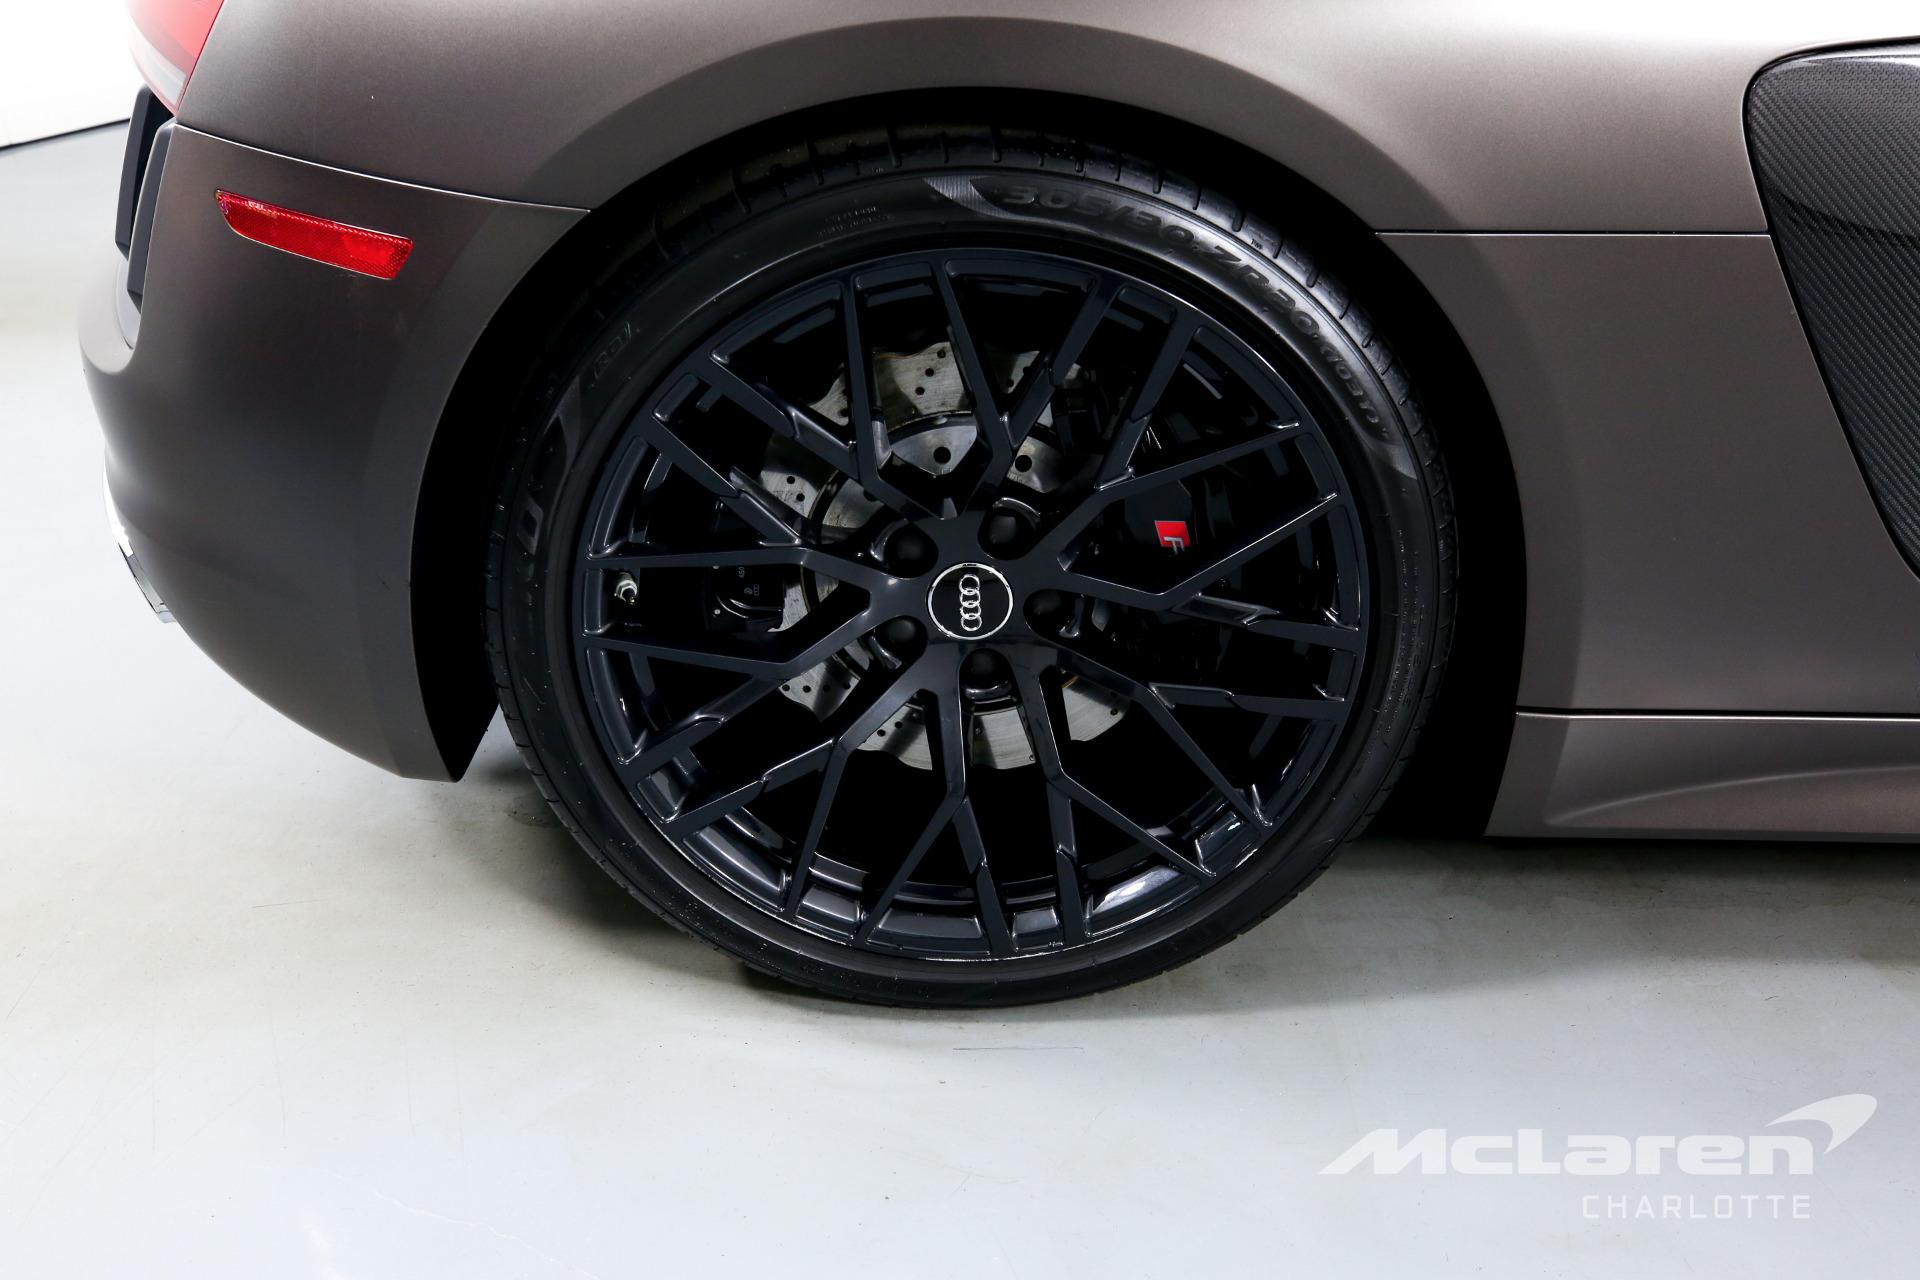 Used 2017 Audi R8 5.2 quattro V10 Spyder | Charlotte, NC